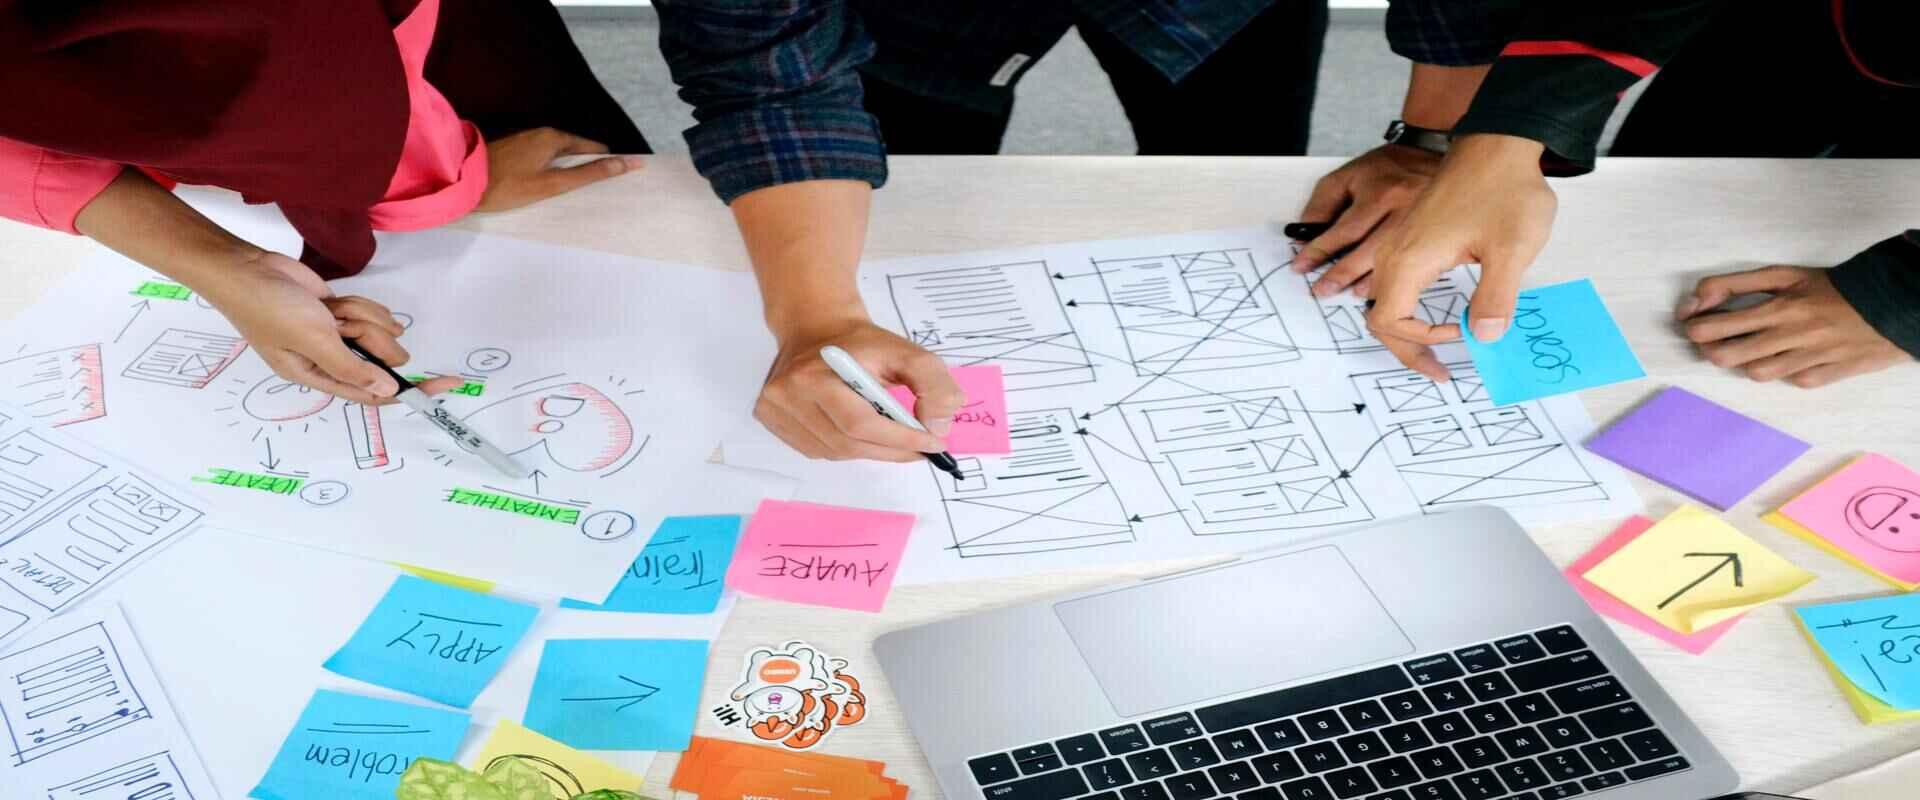 process-documentation-tools